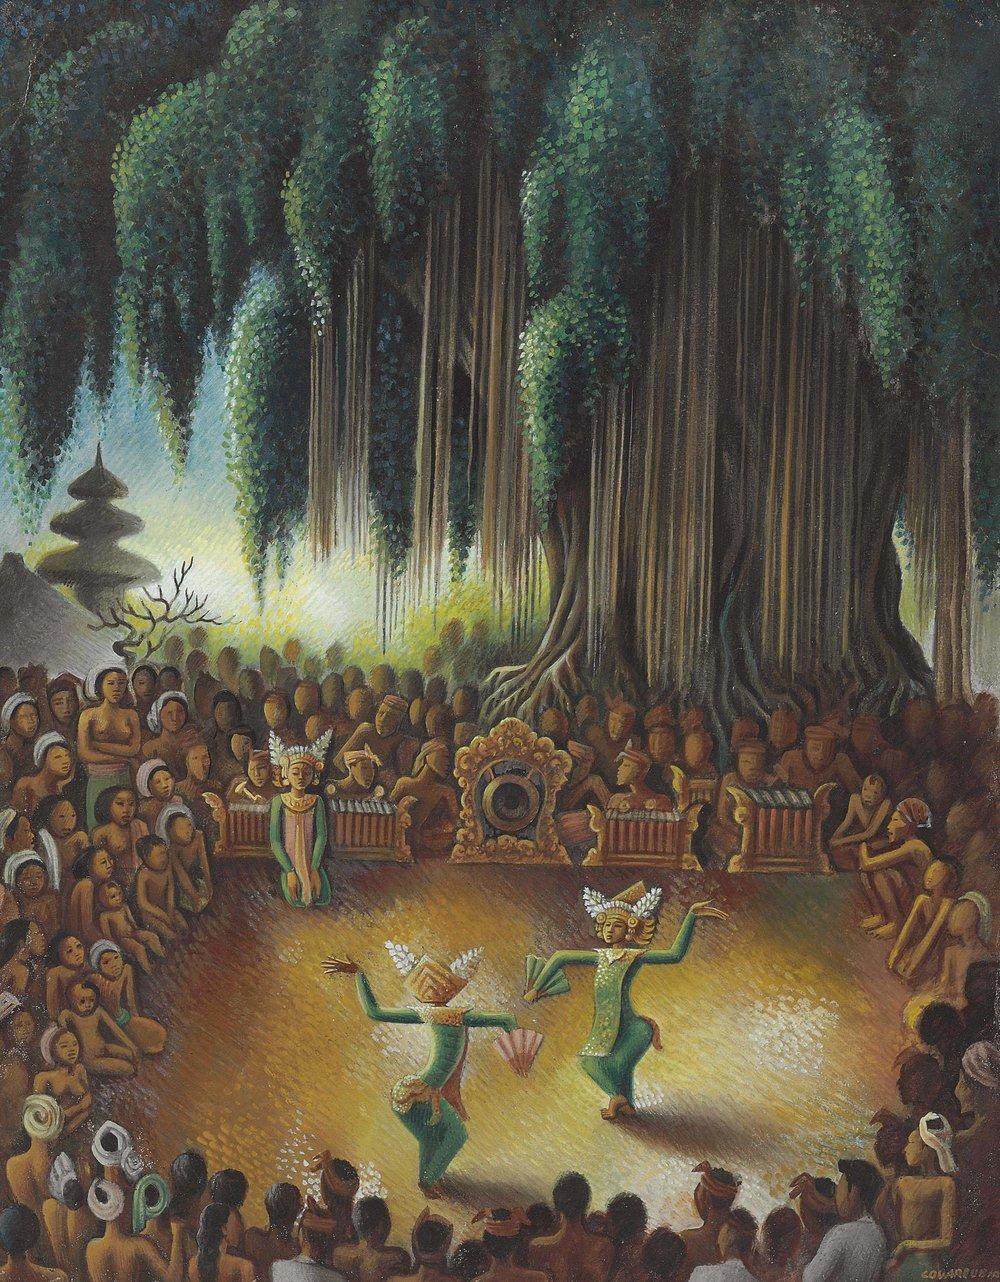 Miguel Covarrubias'  Legong Performance Under Banyan Tree |  Chrities.com